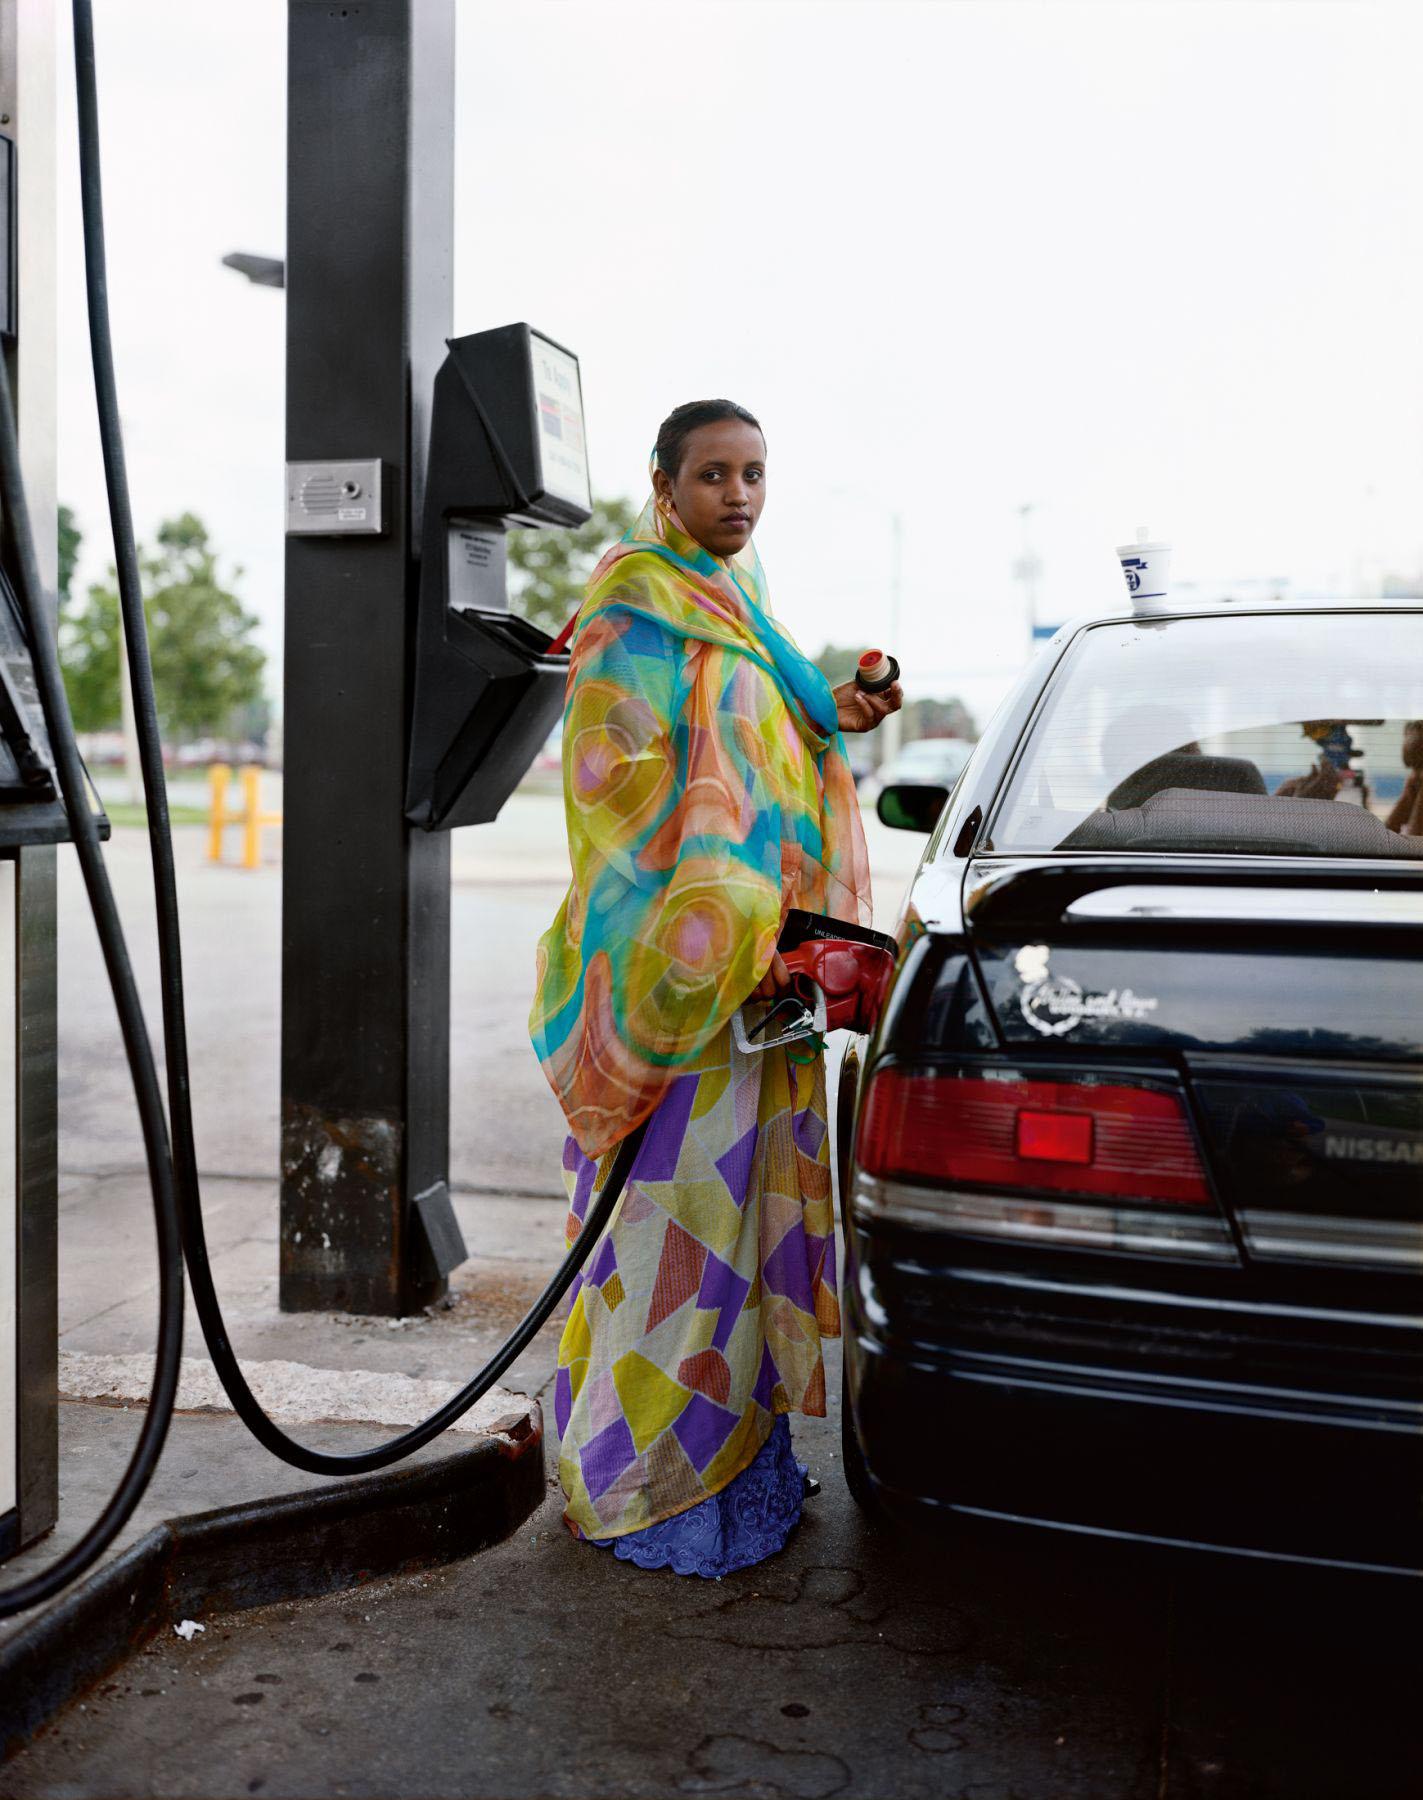 A Woman Pumping Gasoline, Kasas City, Kansas, June 1999